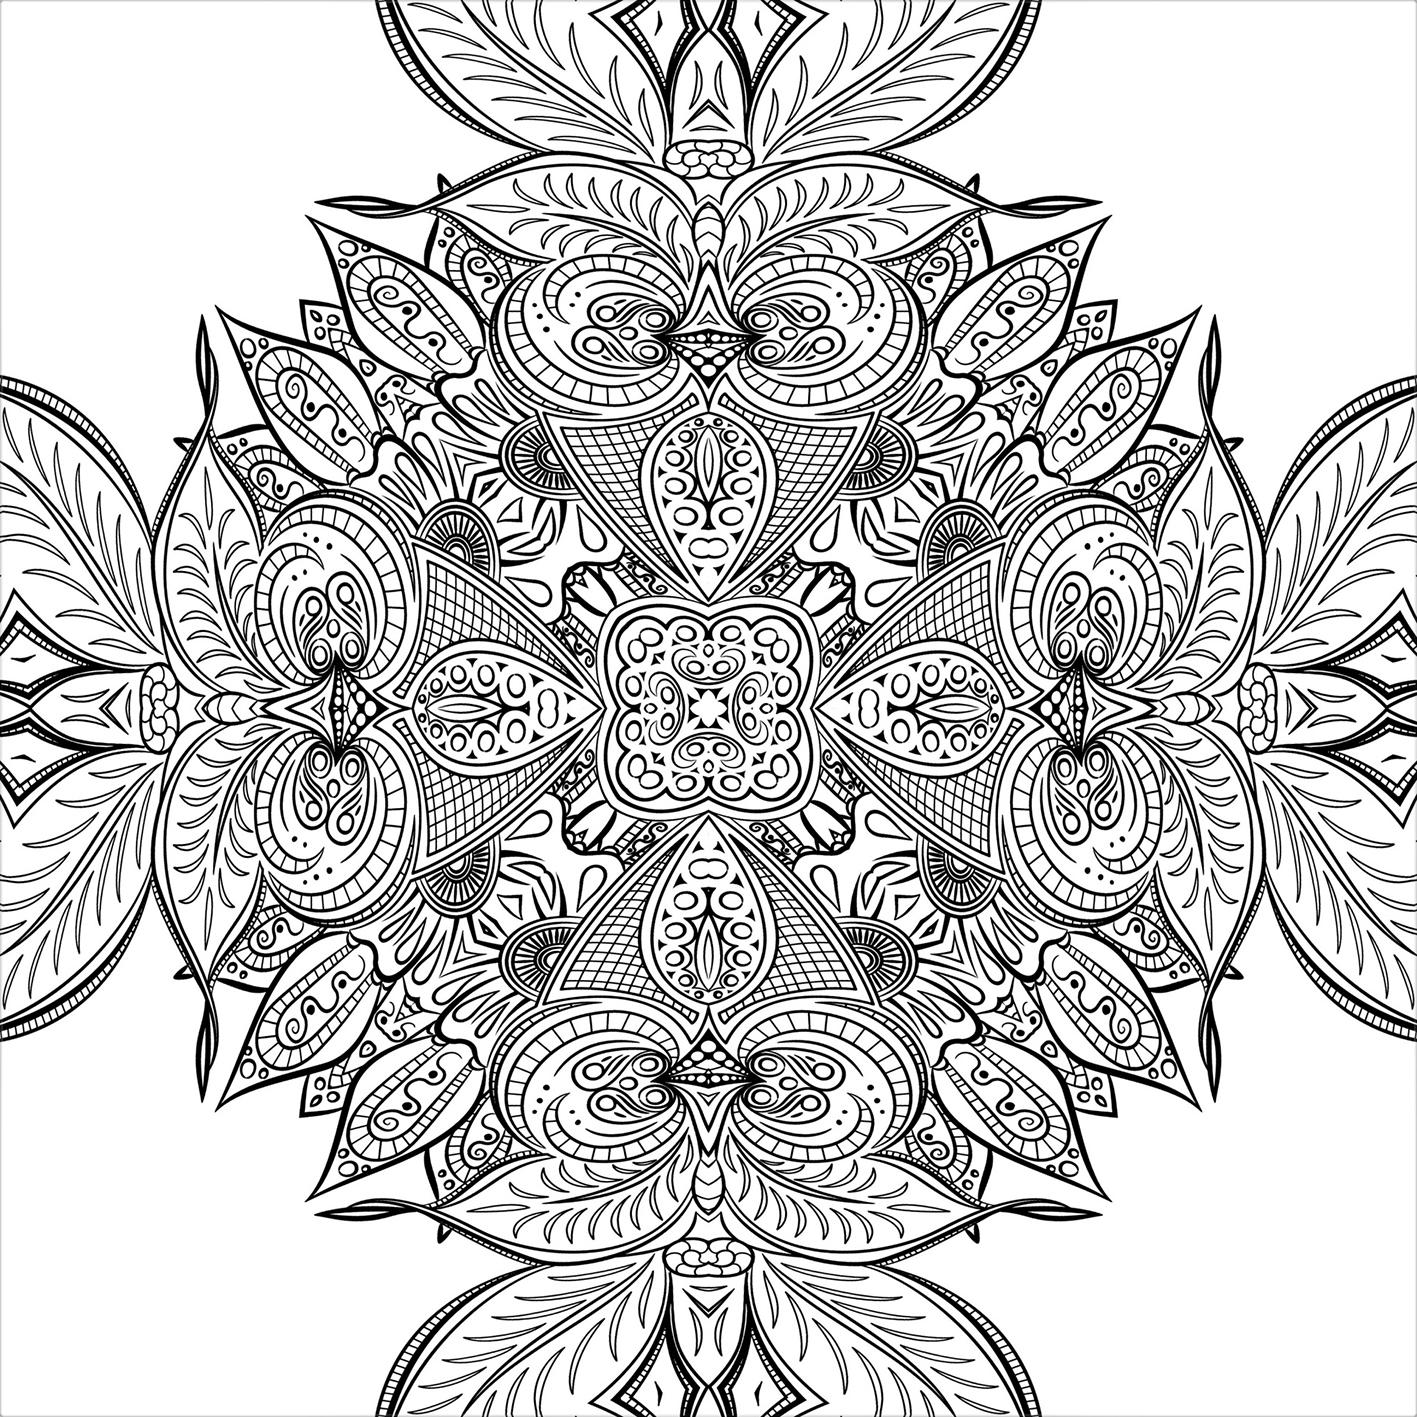 public domain mandala coloring page